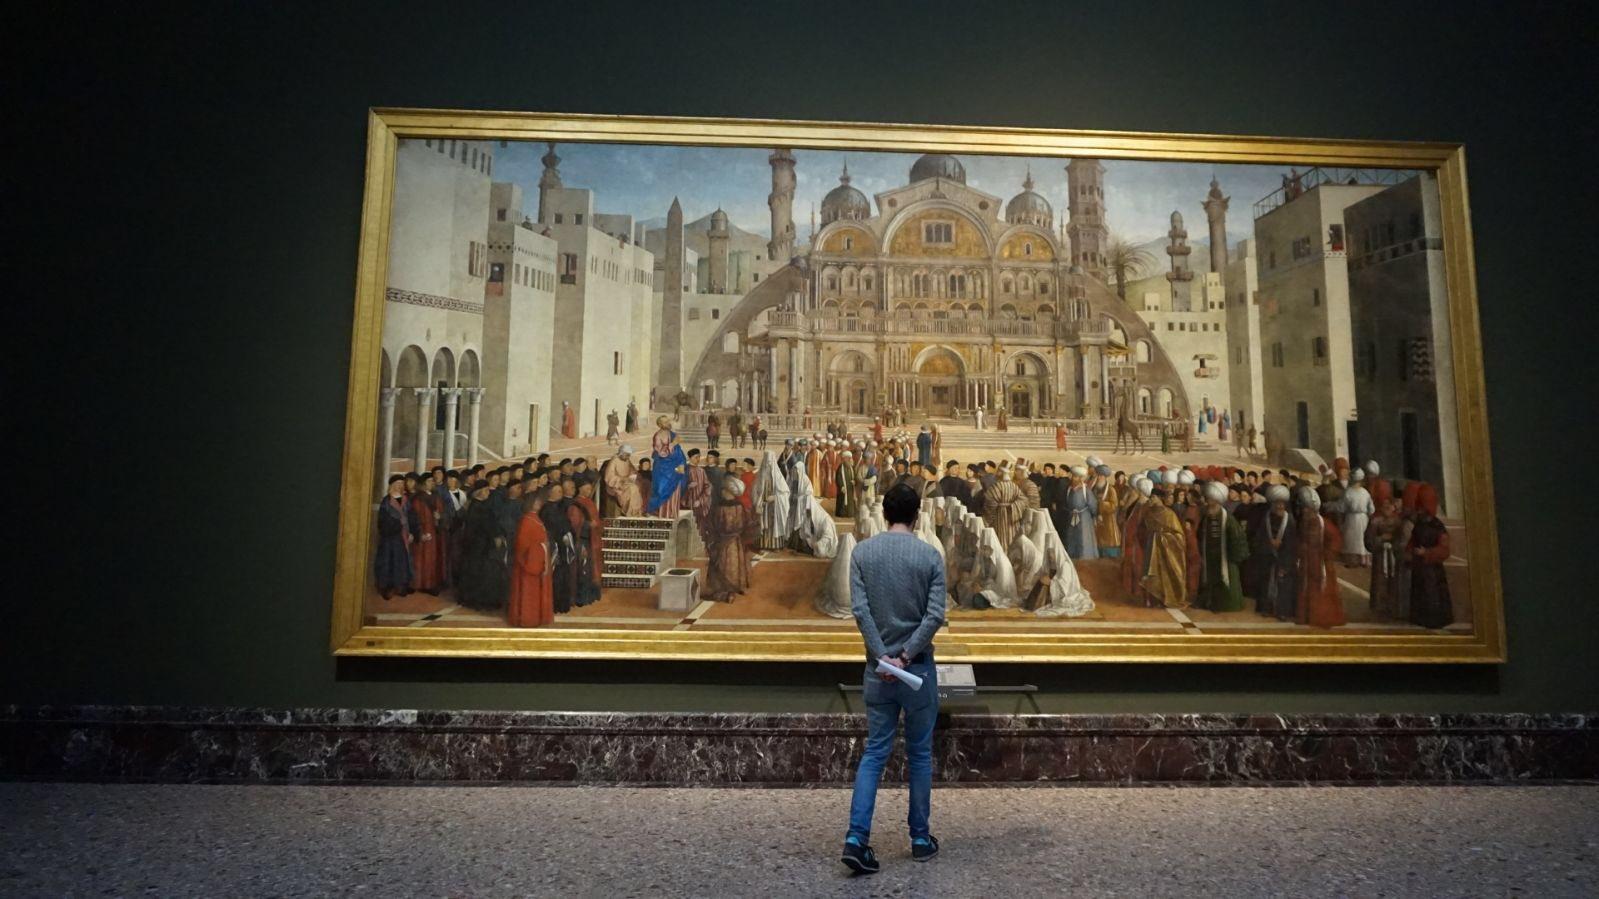 Pinacoteca de Brera #Milán https://t.co/uT0HIWq2v3